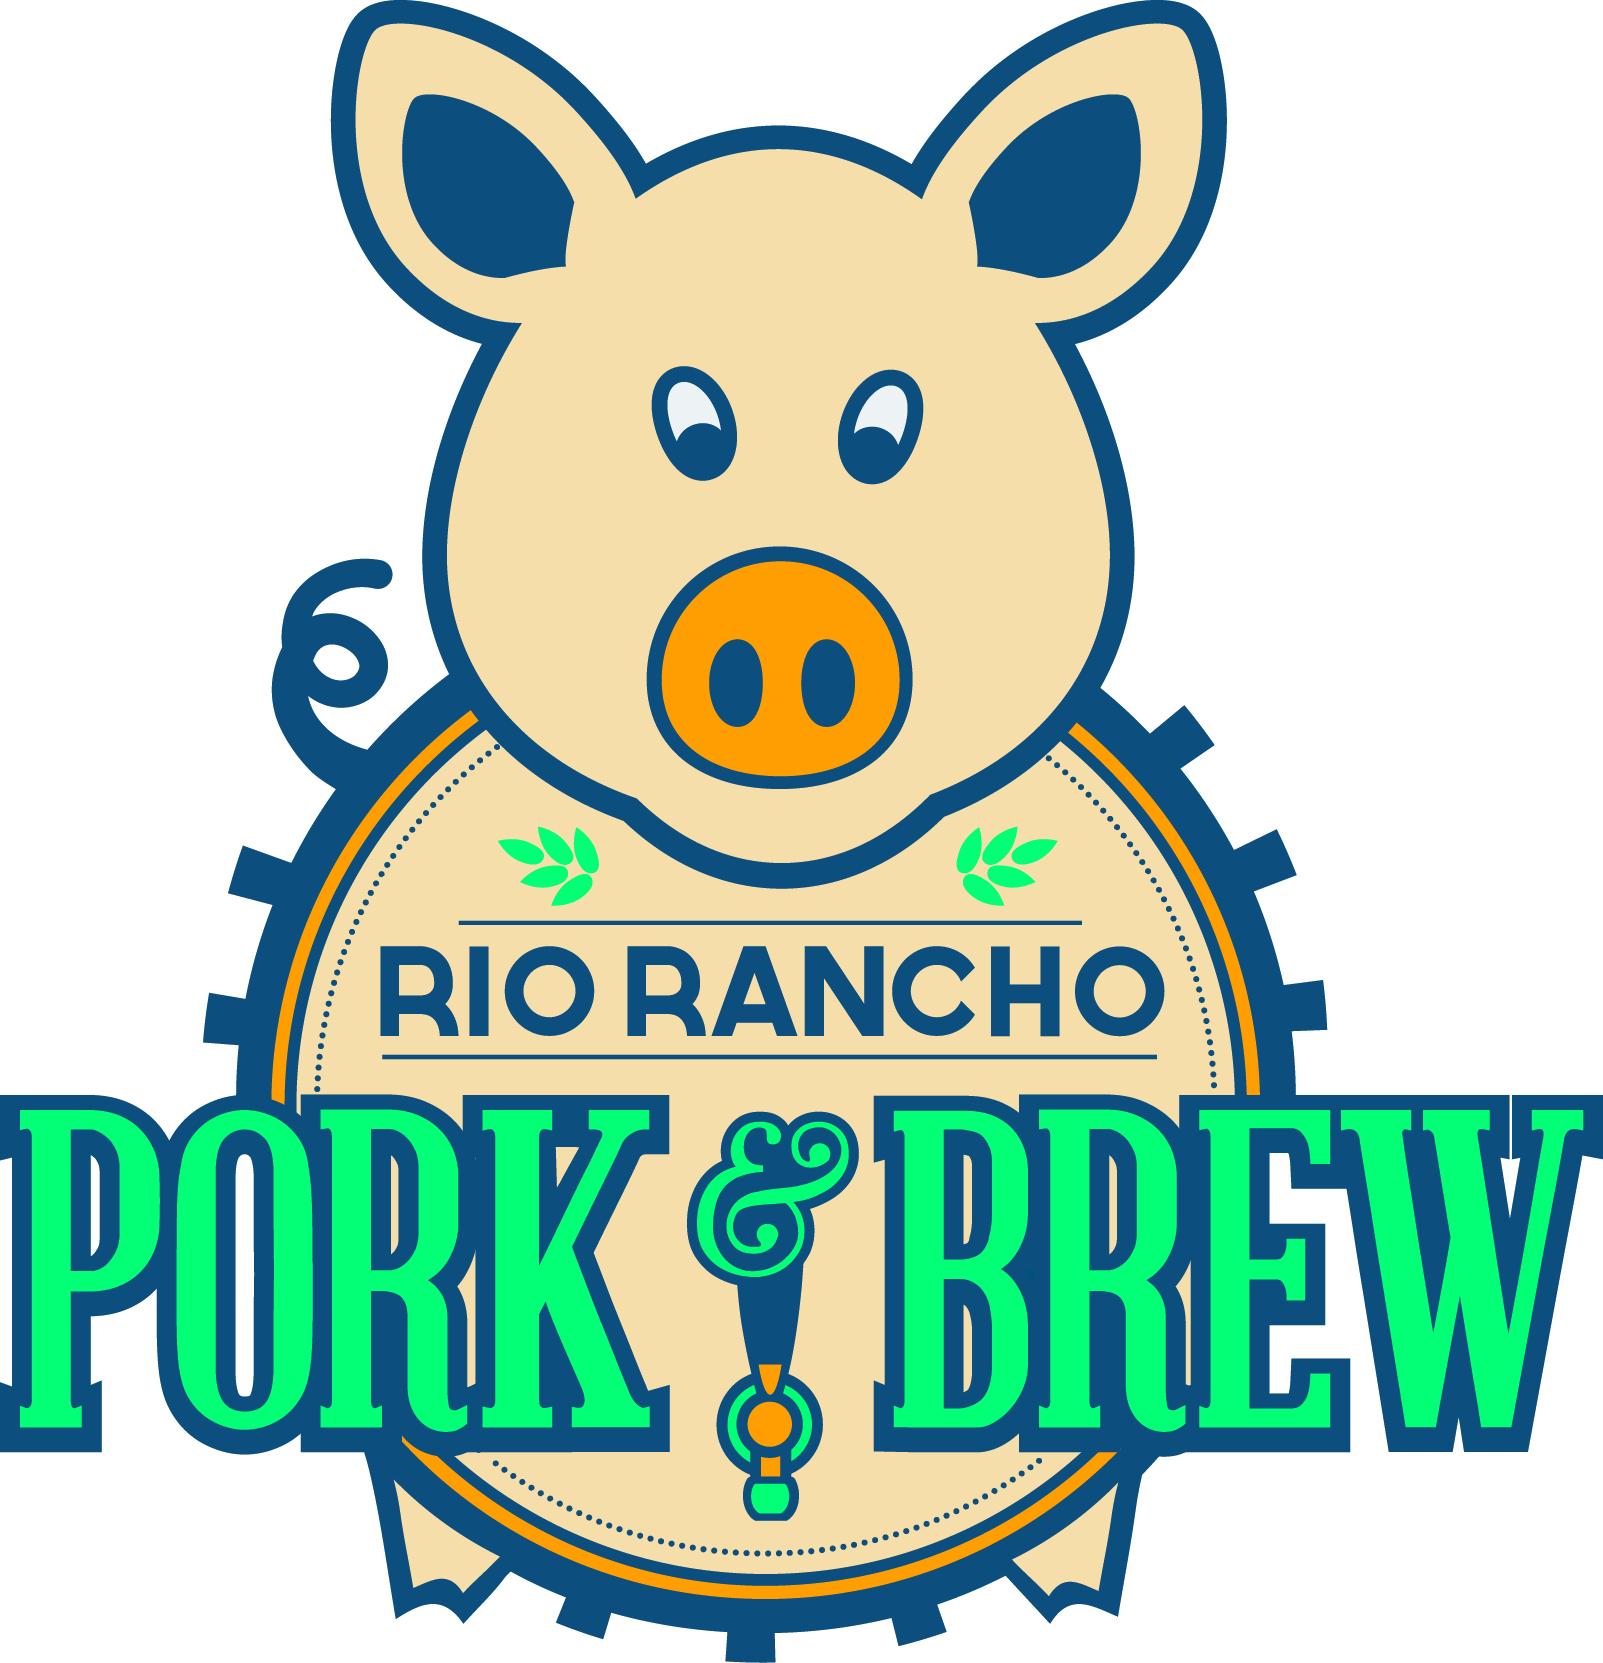 RioRancho_PorkNBrew_Logo_2017_Color_CMYK.JPG